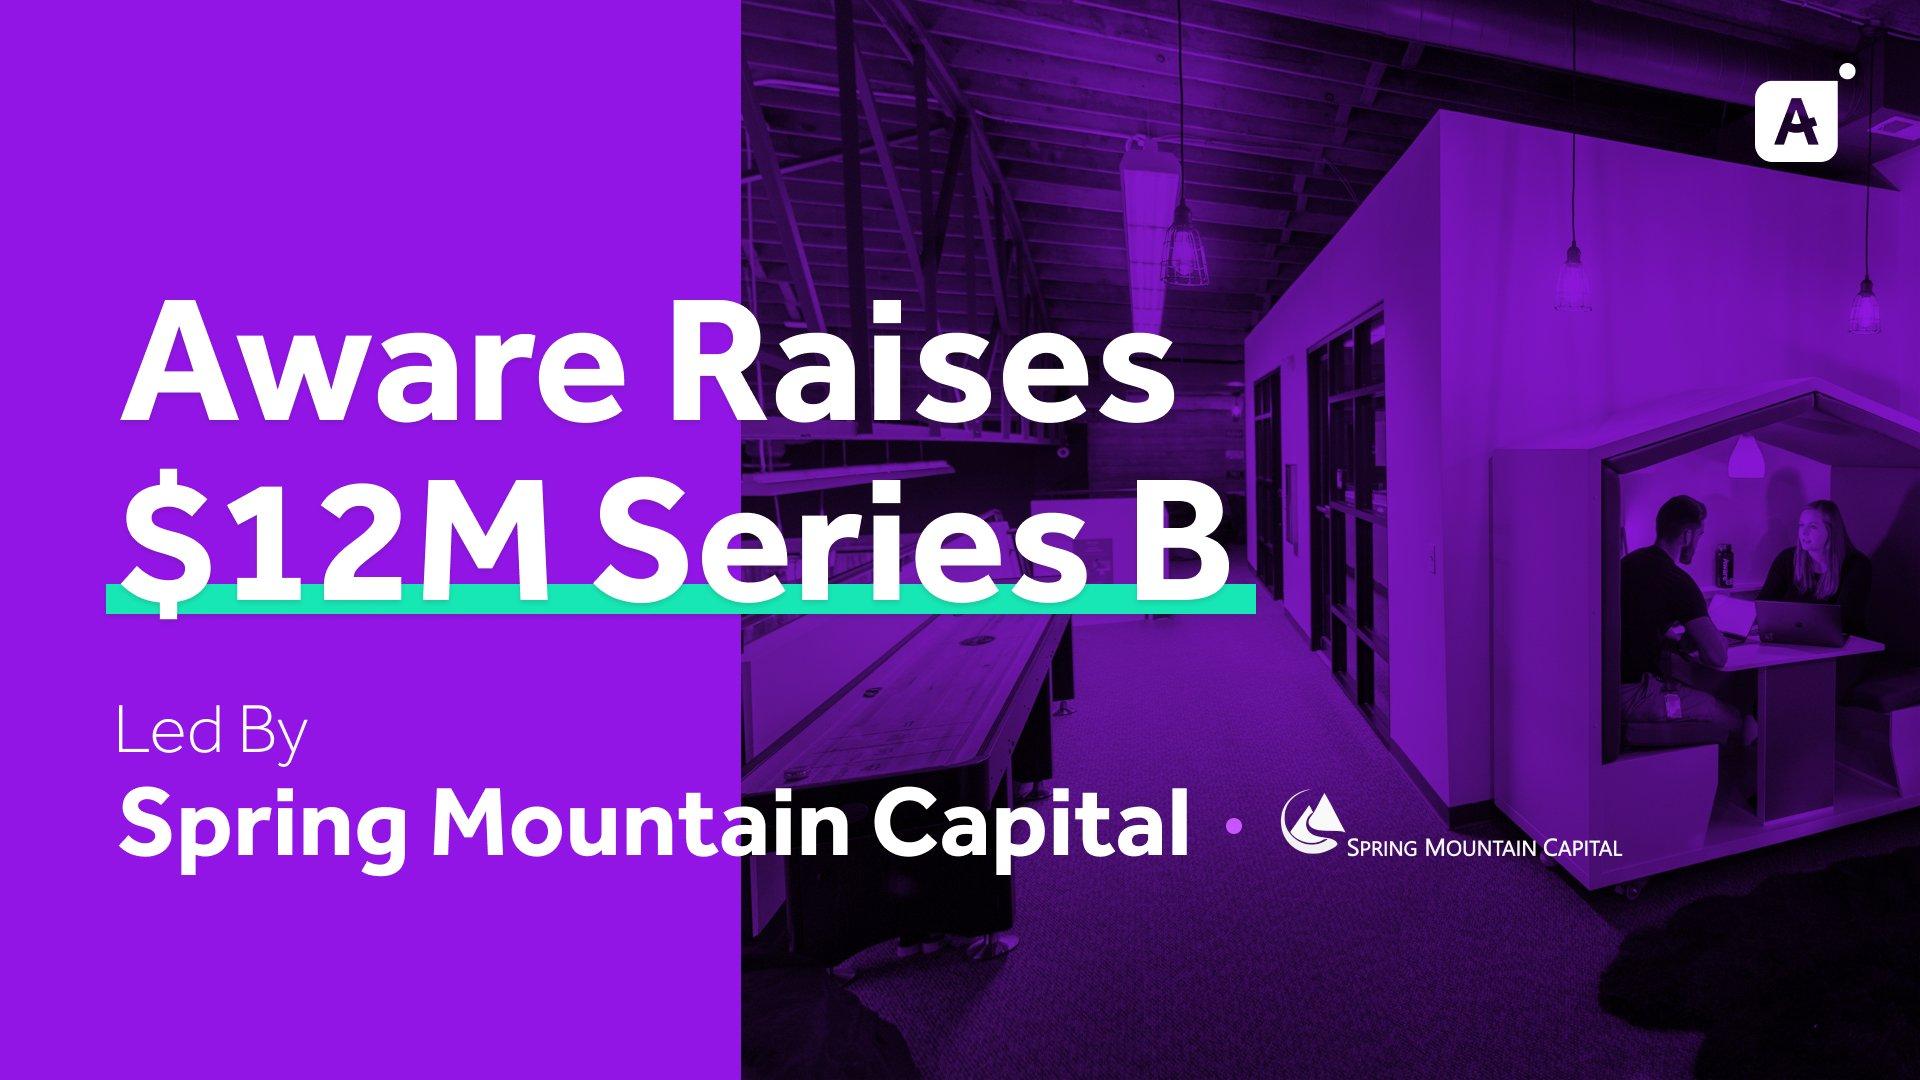 Aware Raises $12M Series B Led By Spring Mountain Capital